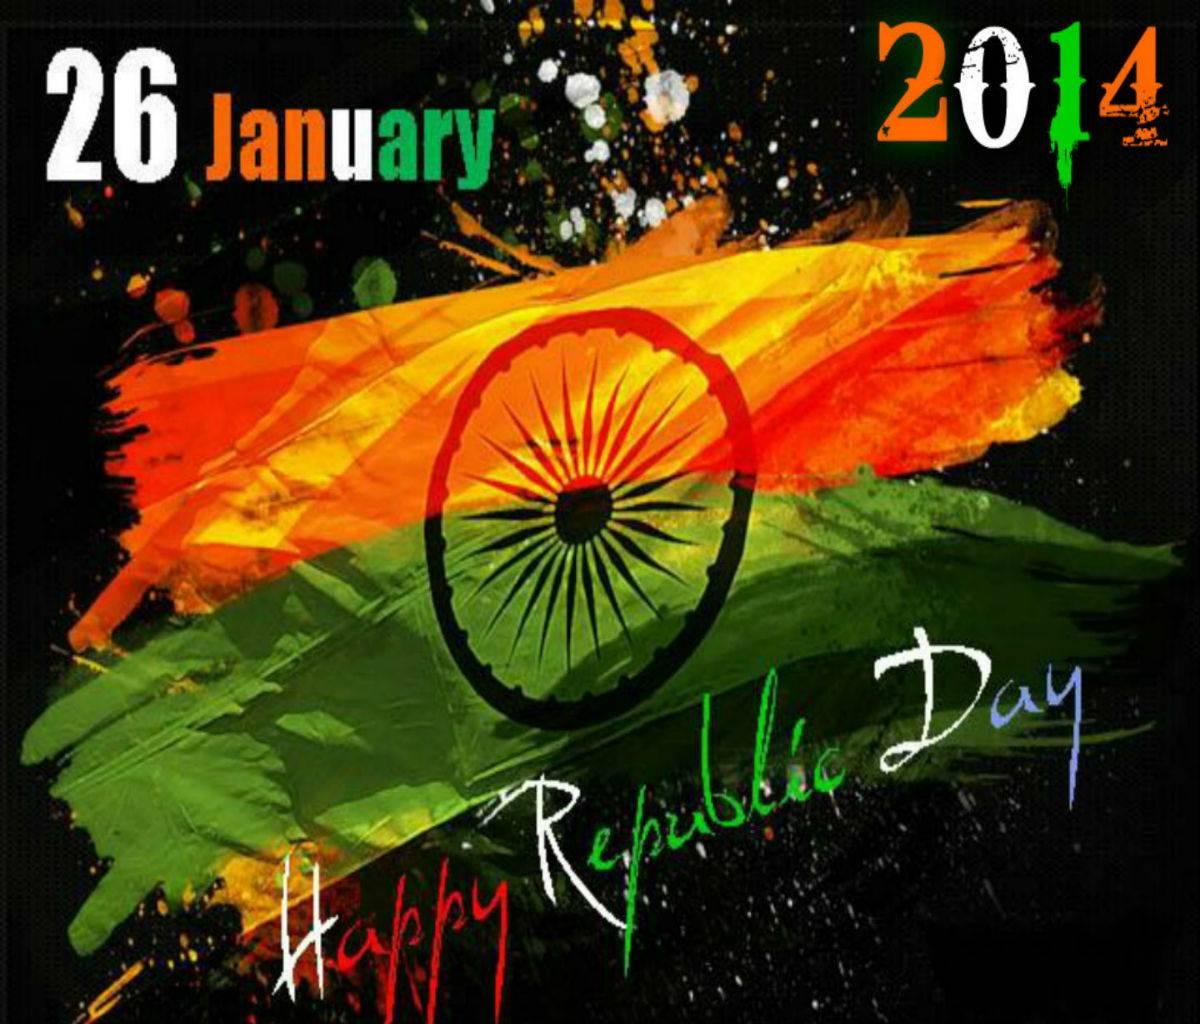 Republic Day 2014